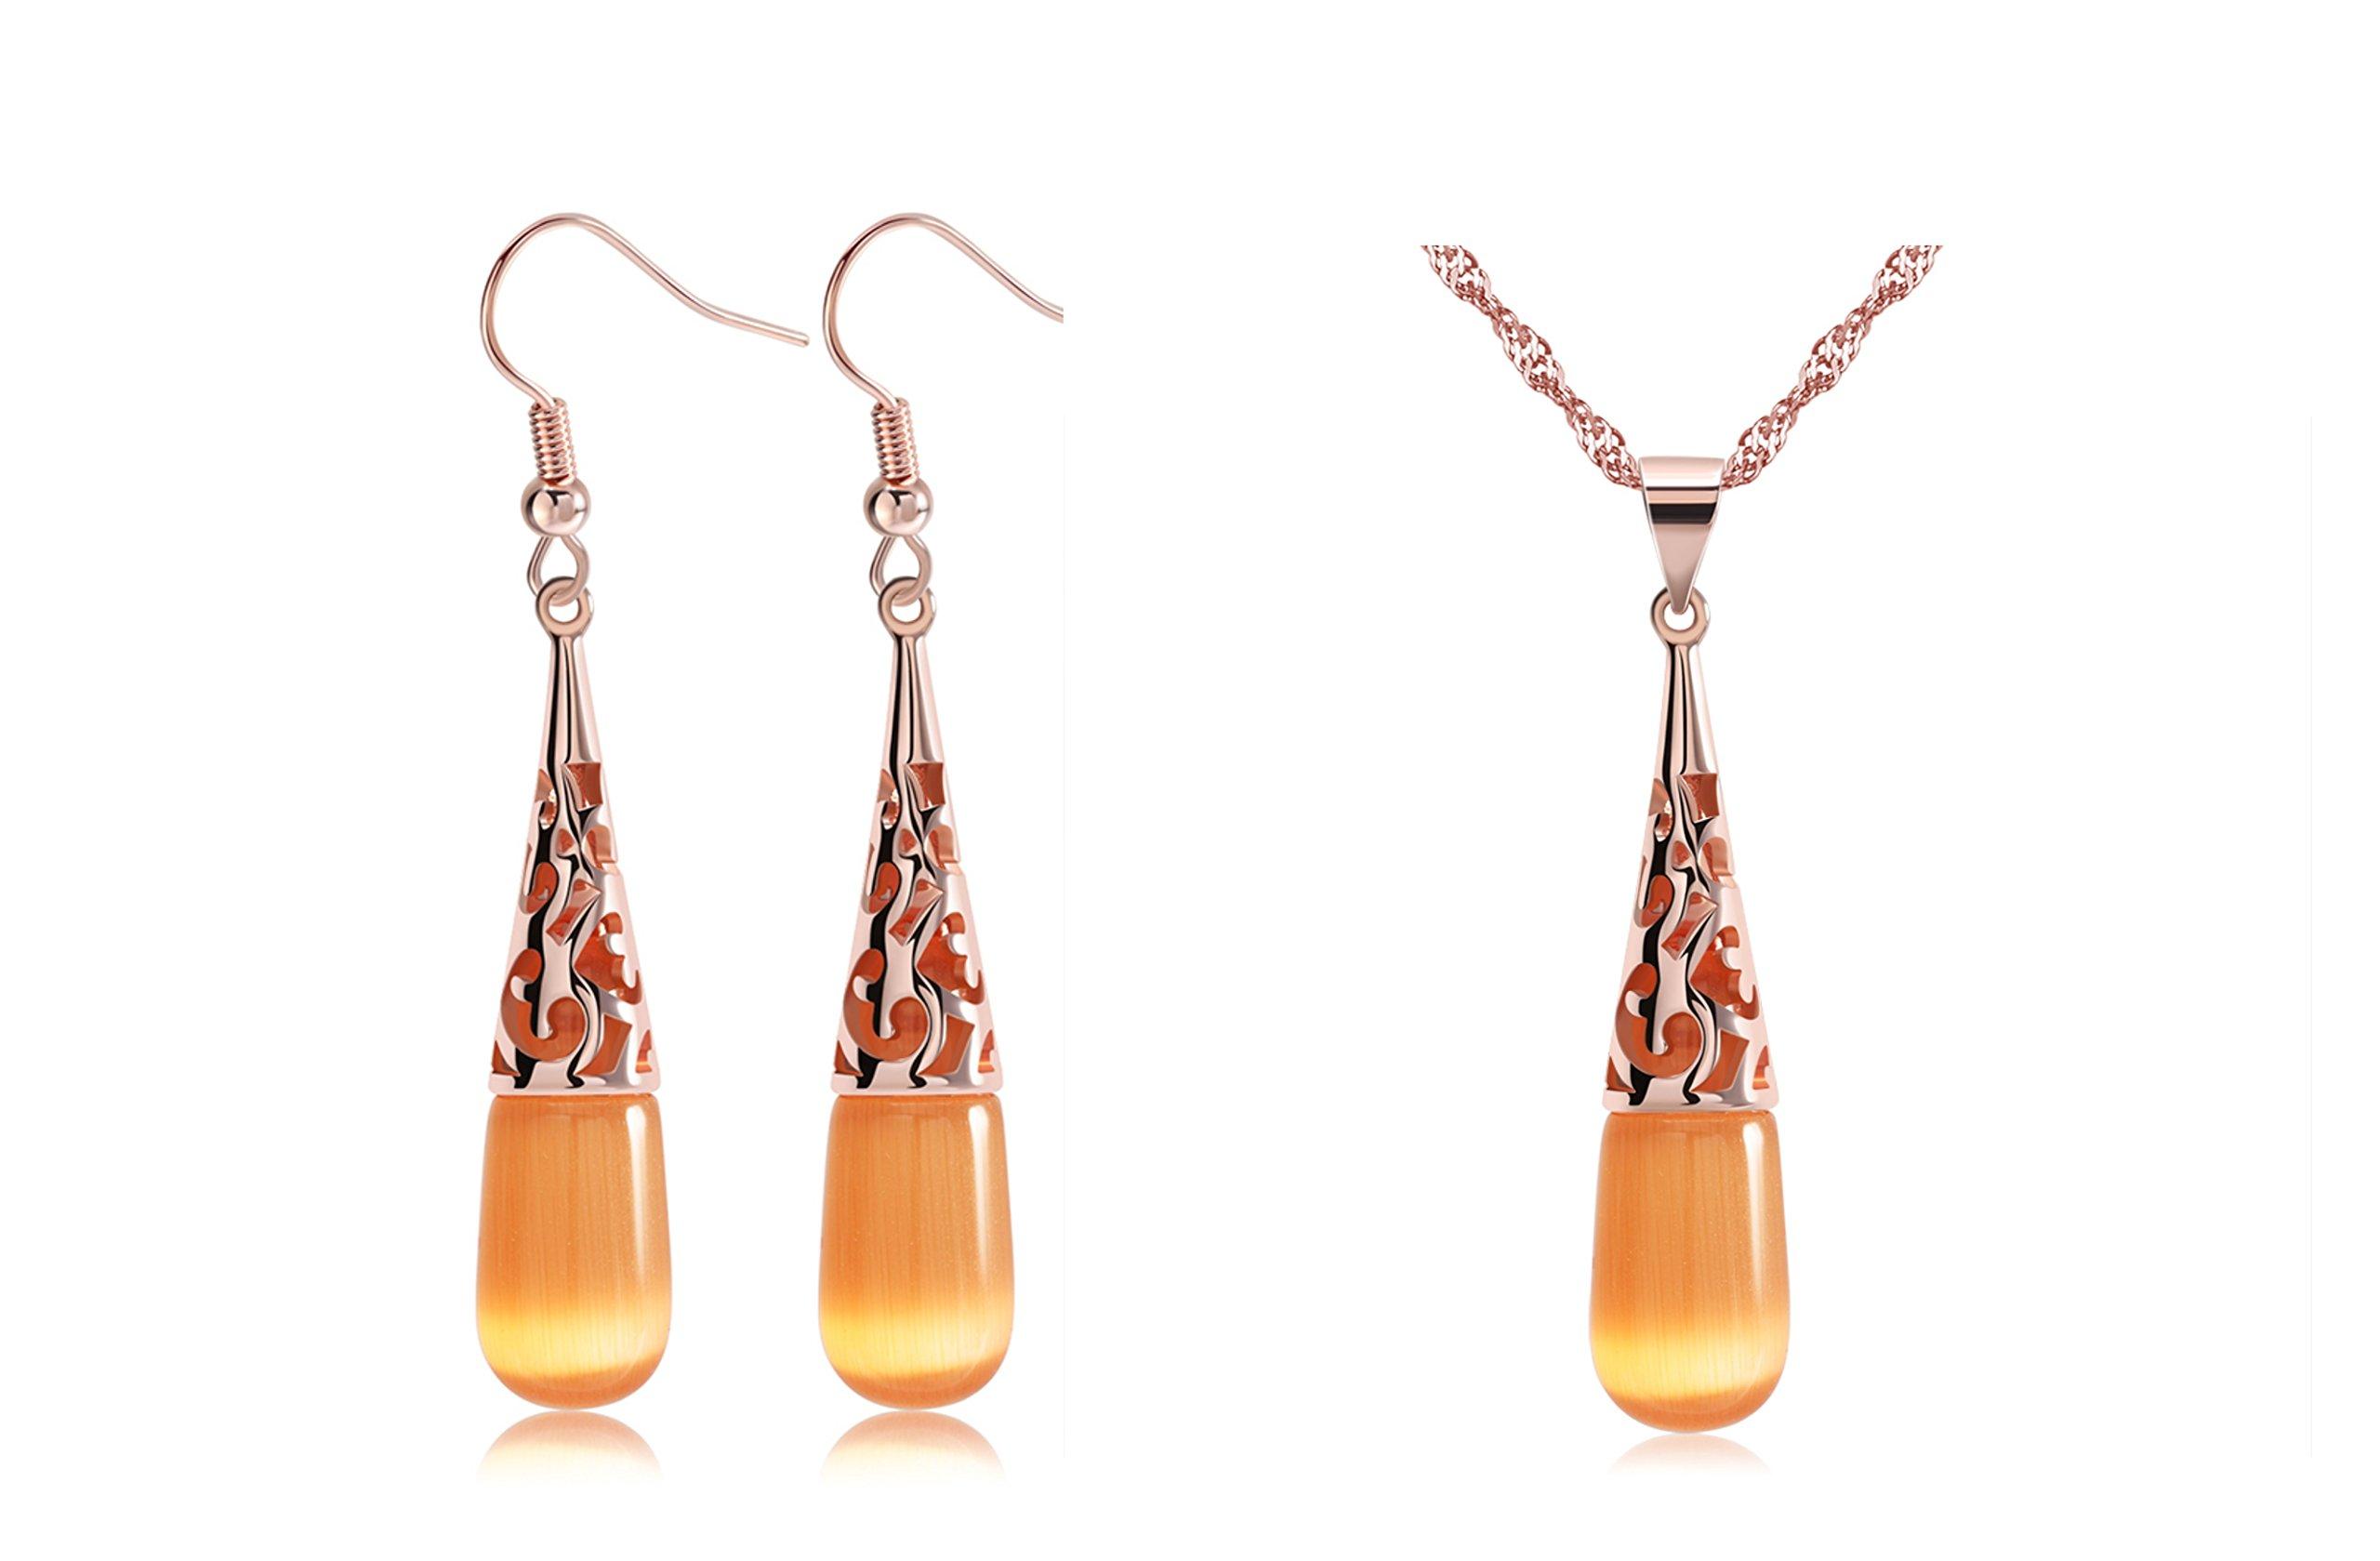 UPRIMOR Elegant 18K Rose Gold Plated Cat's Eye Stone Jewelry Set, Matching Pendant Necklace Earrings Set for Women Girls